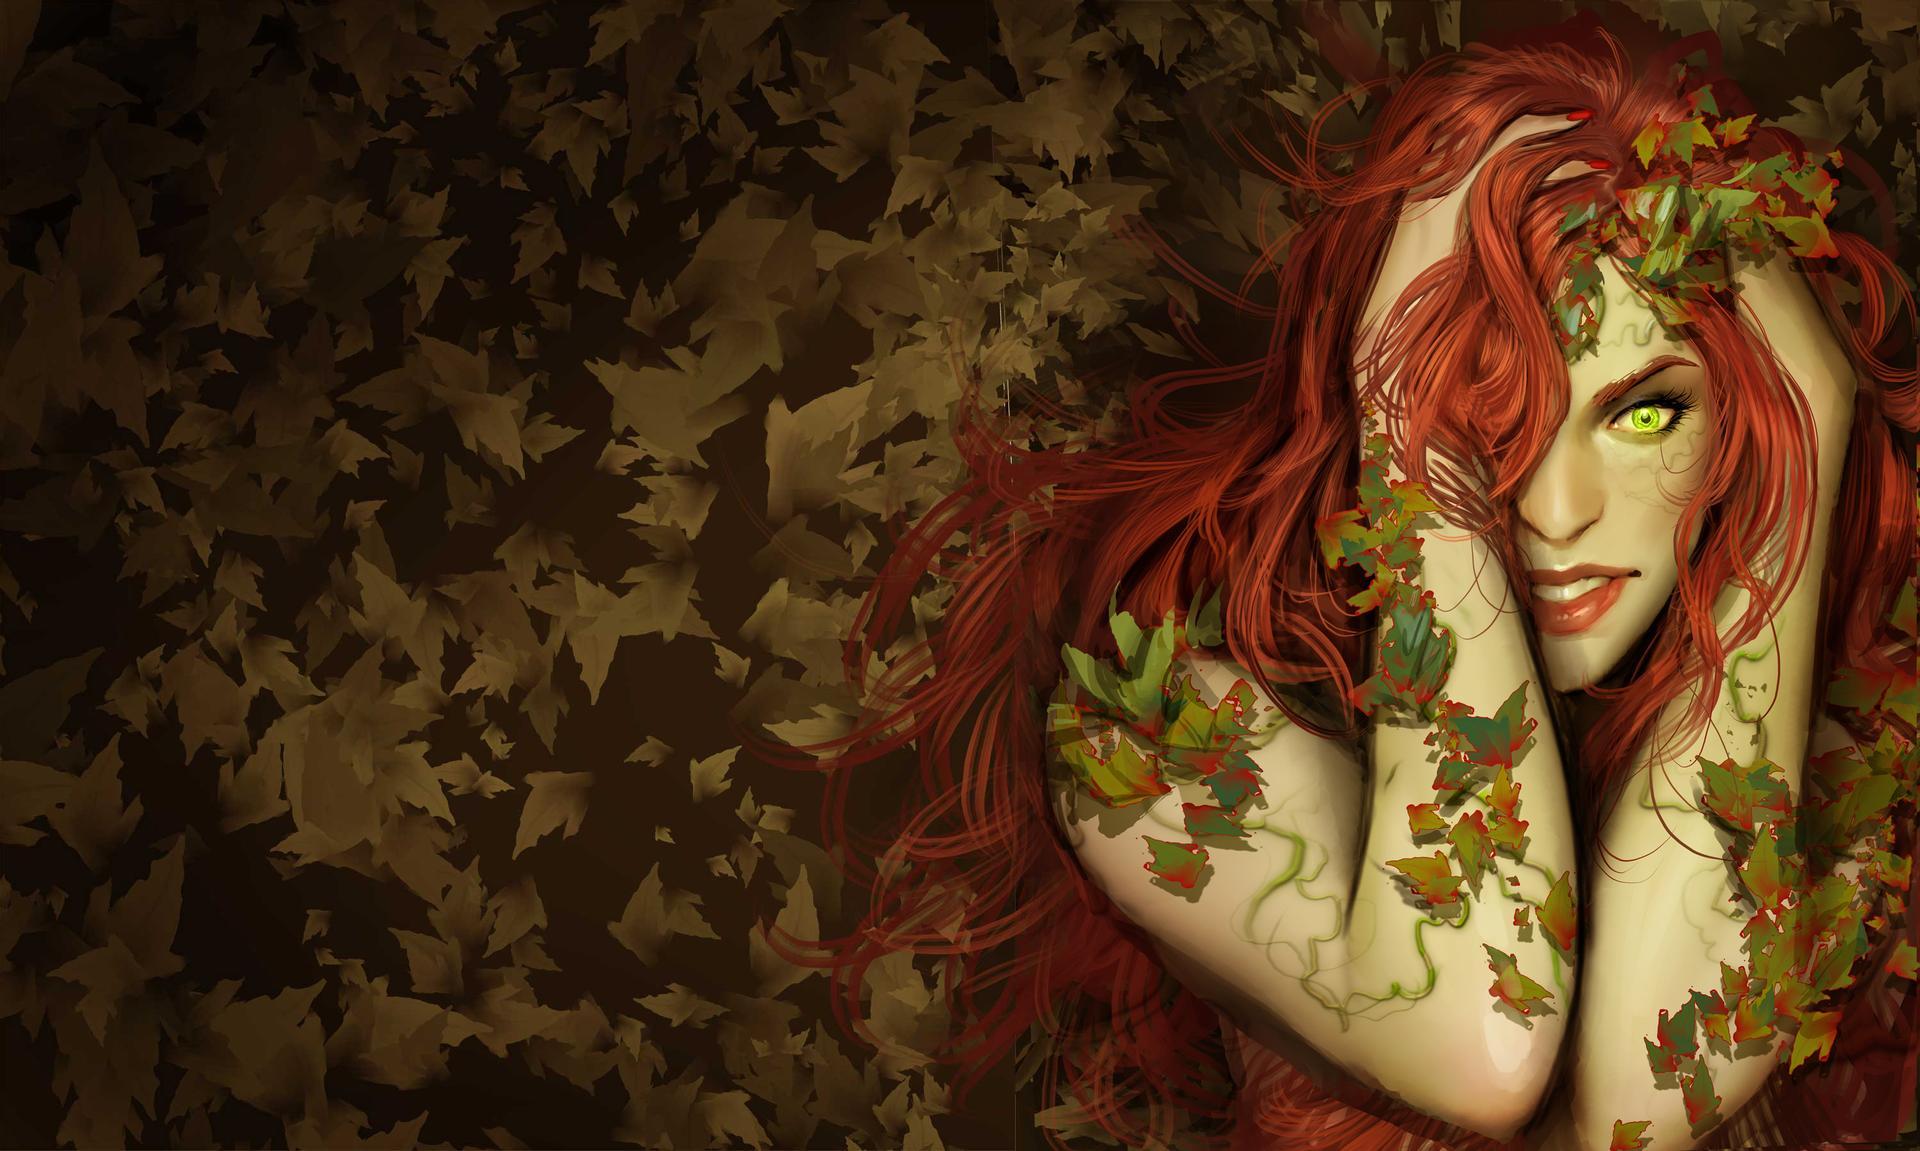 Poison Ivy 4k Ultra HD Wallpaper | Background Image